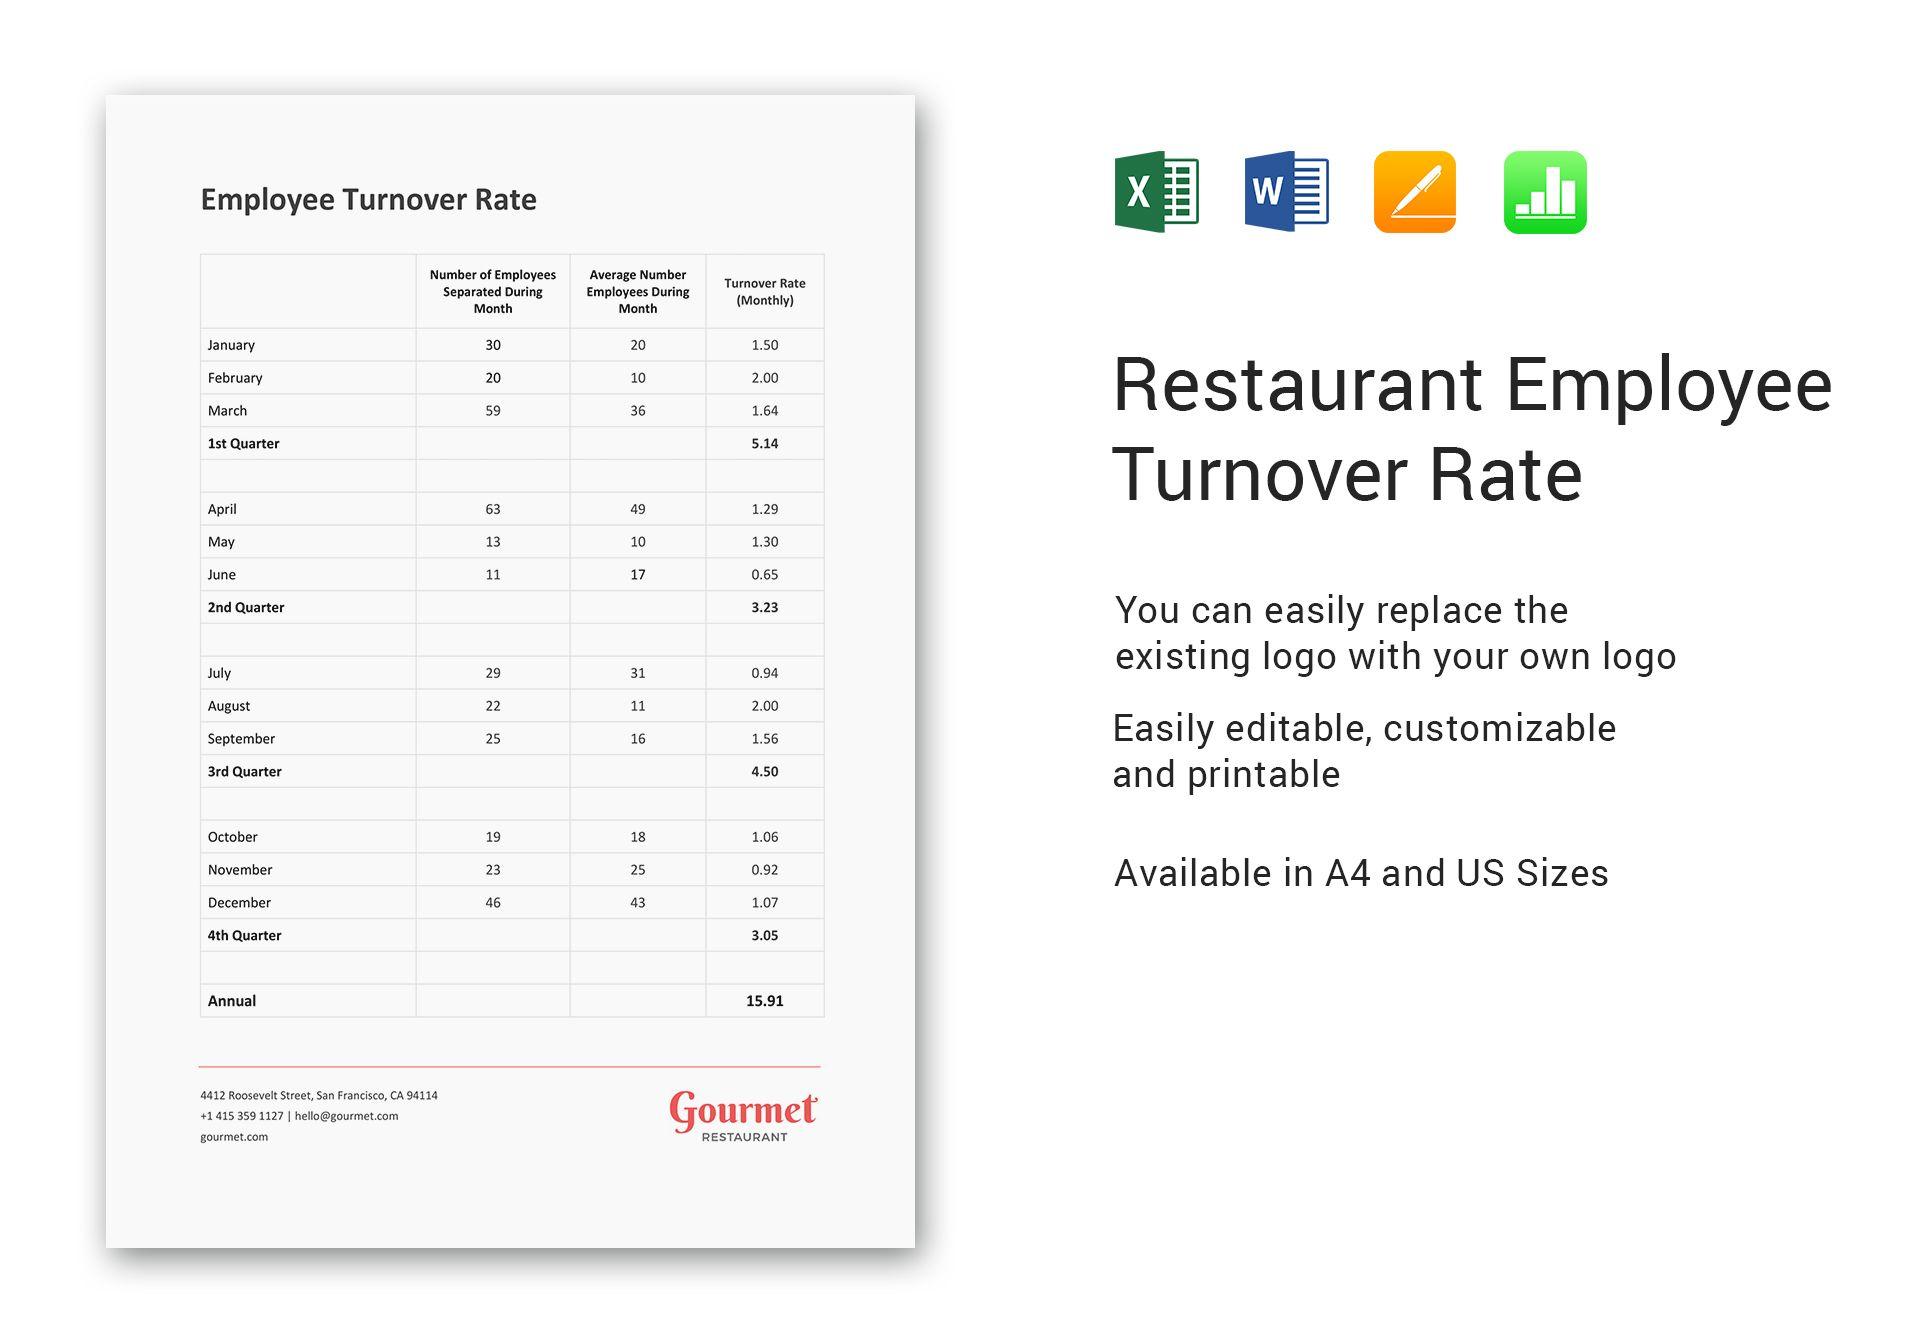 Restaurant Employee Turnover Rate